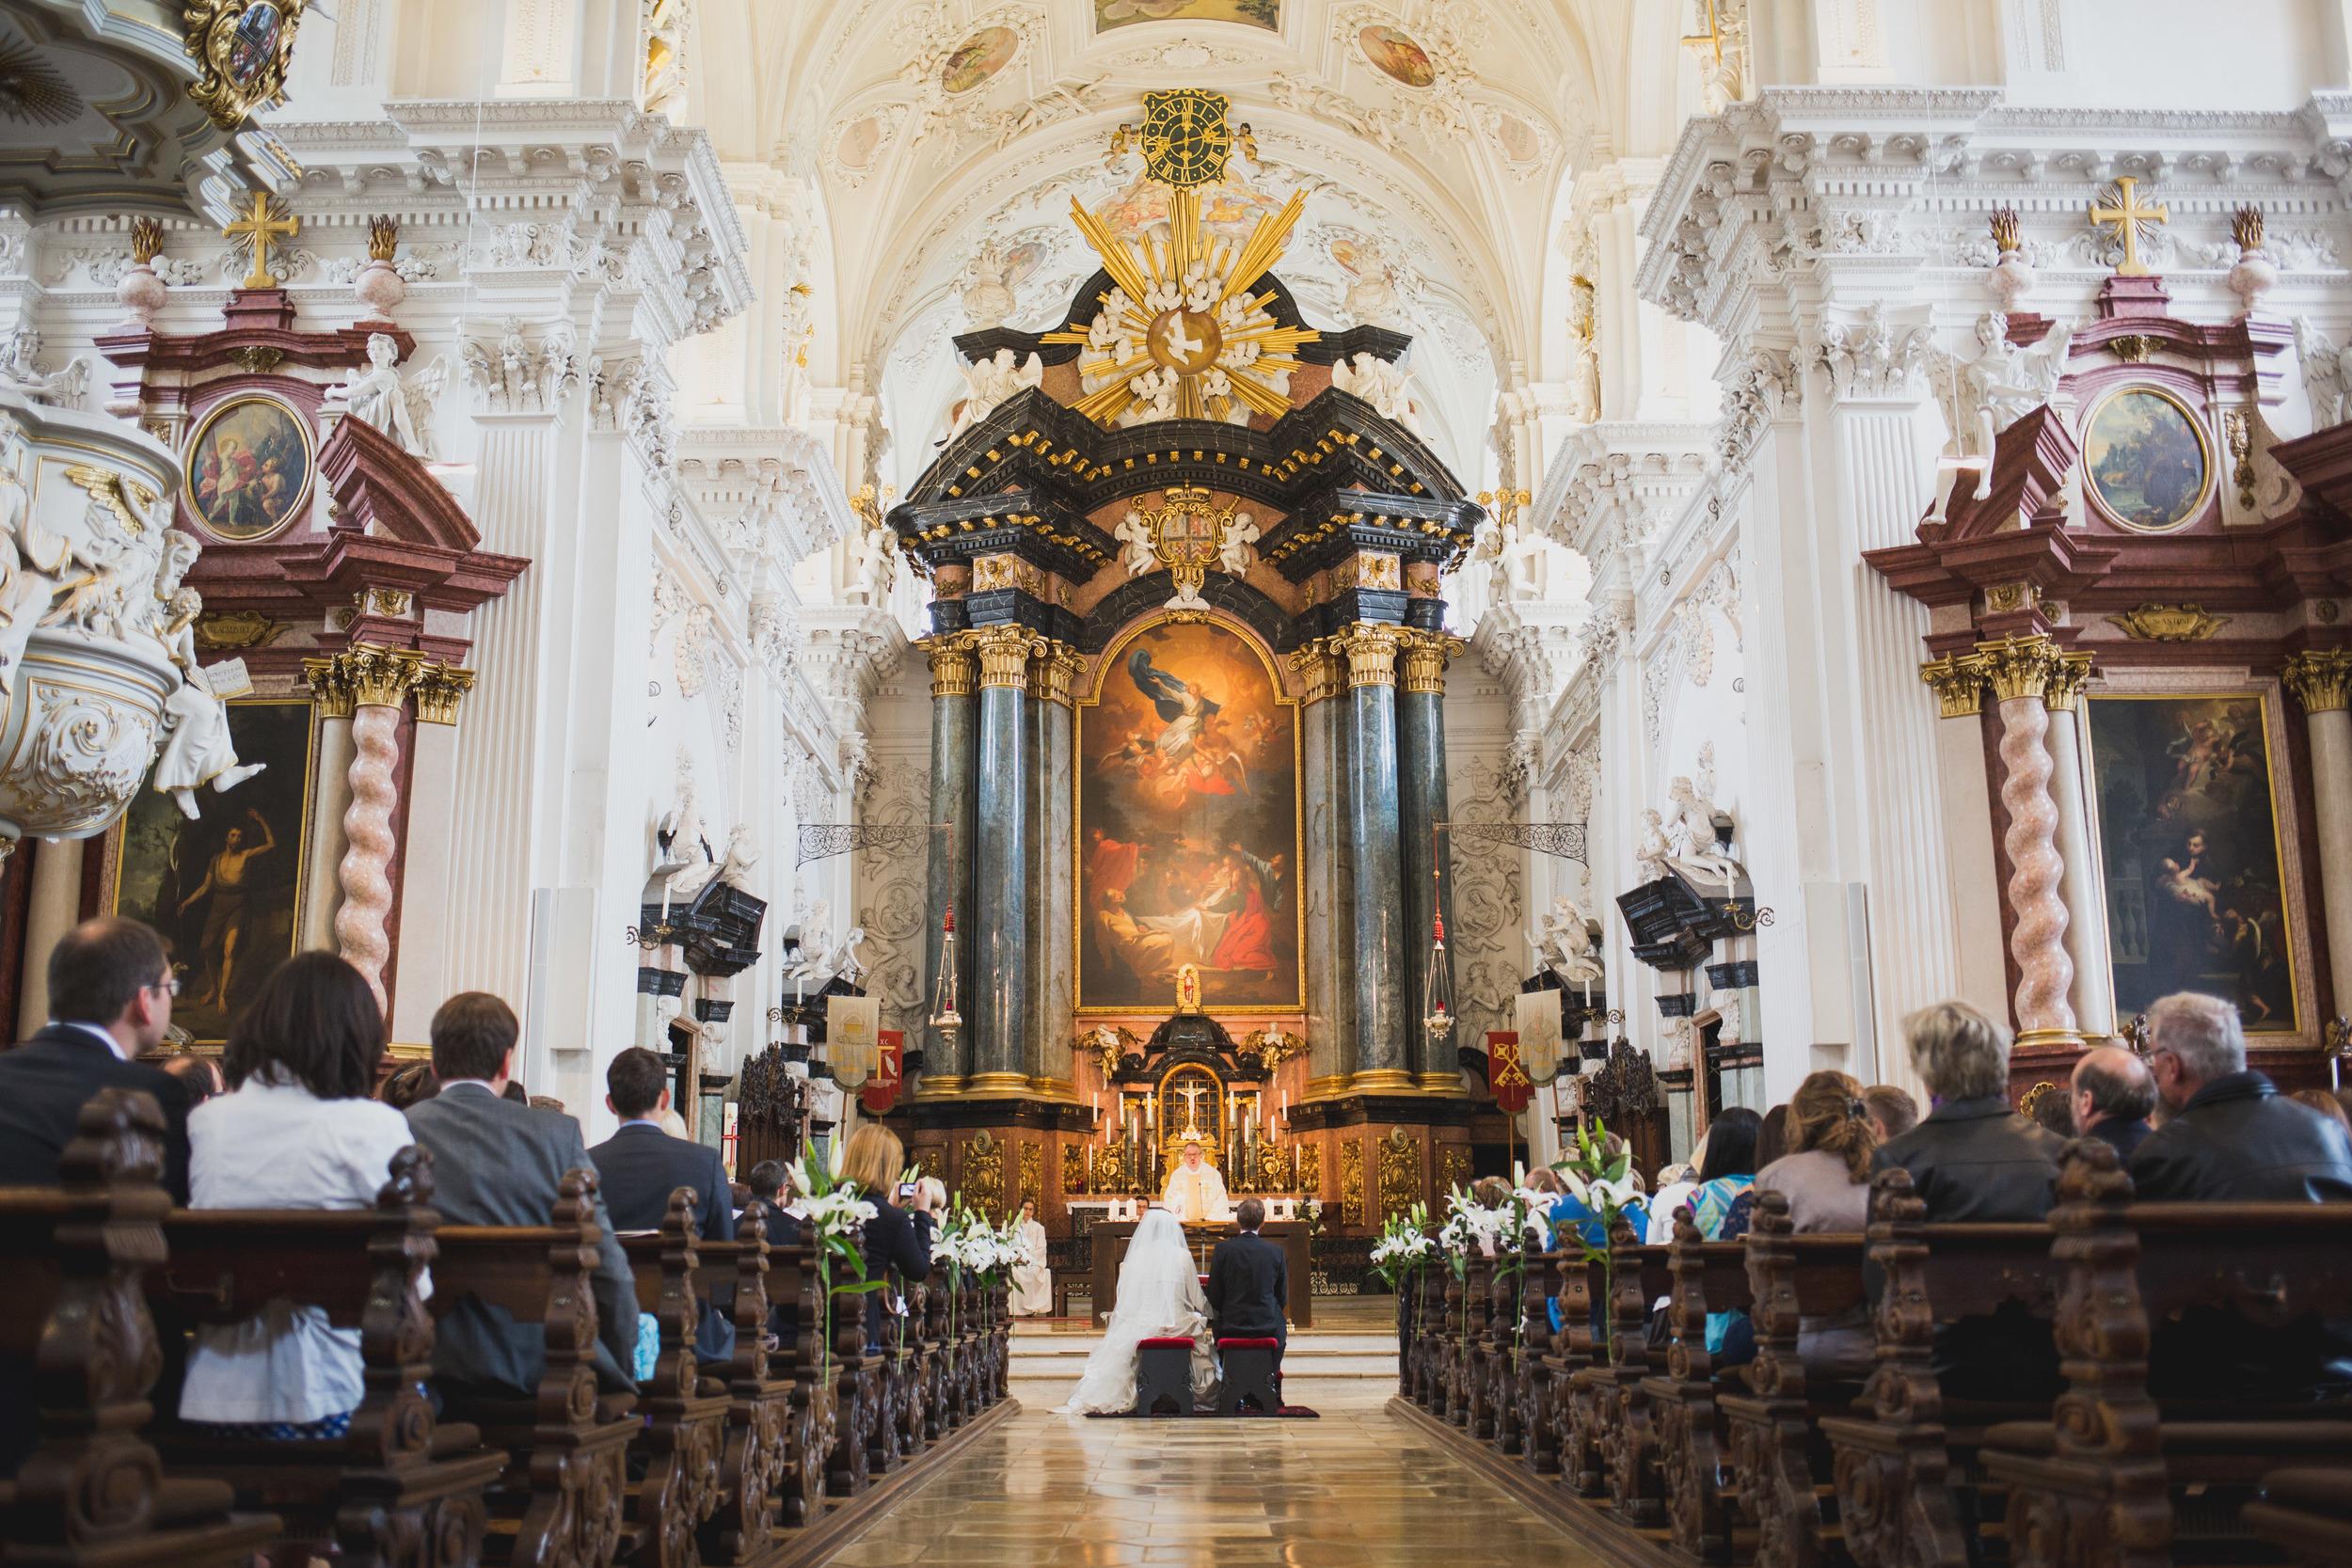 Pauline-Und-Christoph-Buffalo-NY-Wedding-by-Stefan-Ludwig-Photography-315.jpg